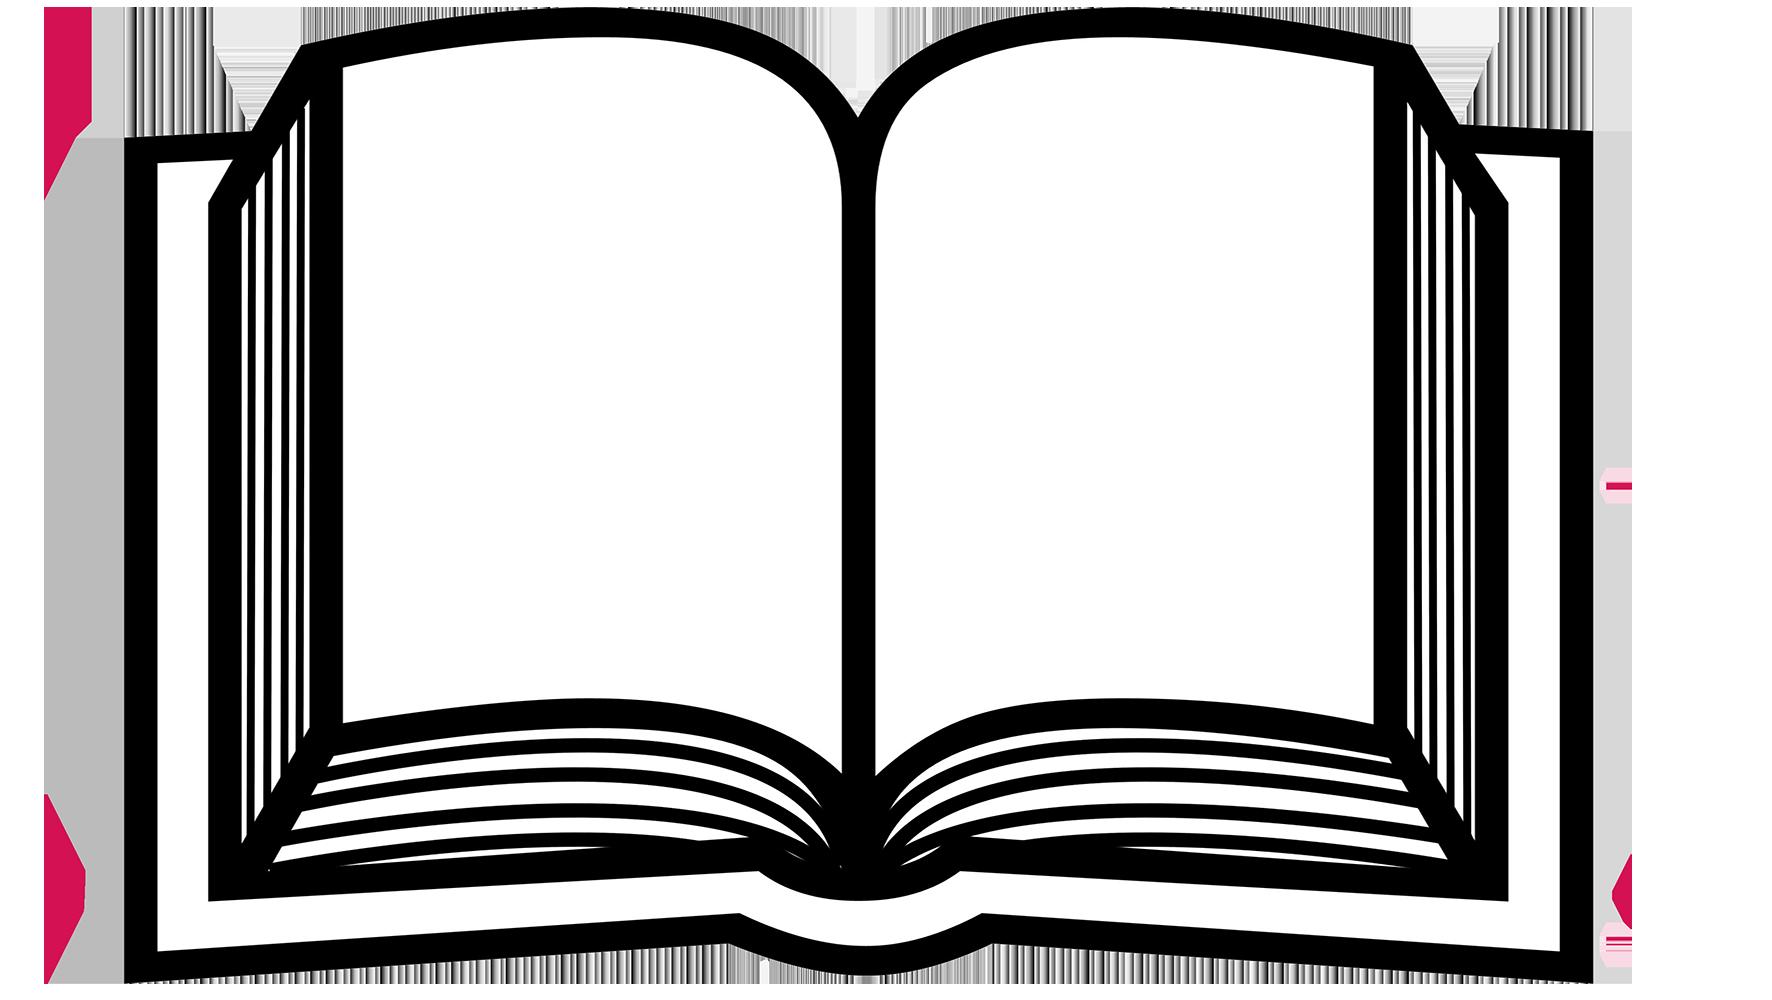 silhouette of open book